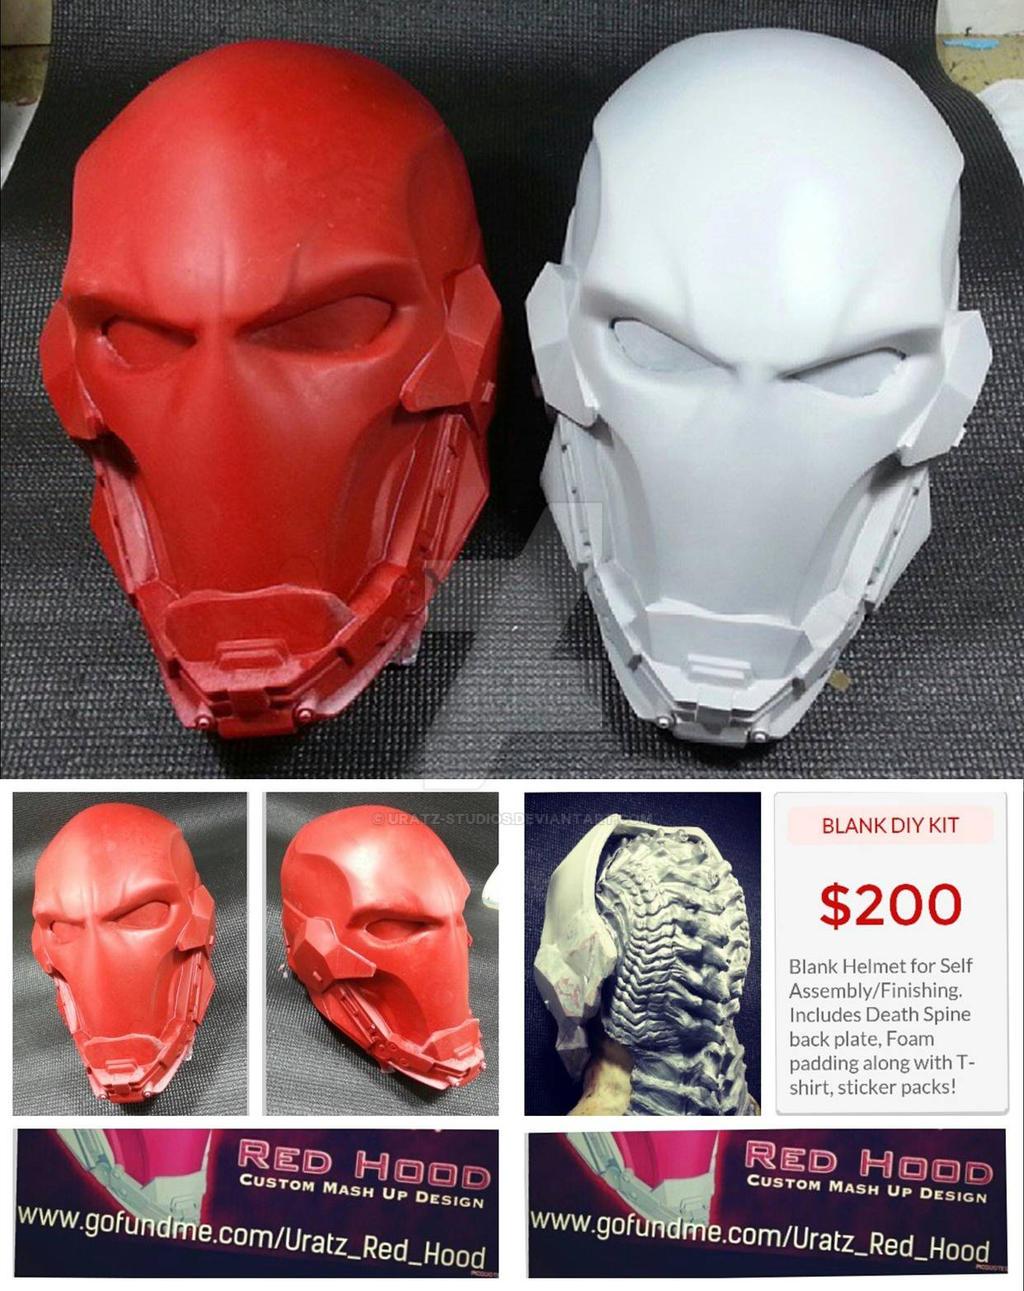 Red hood uratz by uratz studios on deviantart - Uratz studios ...